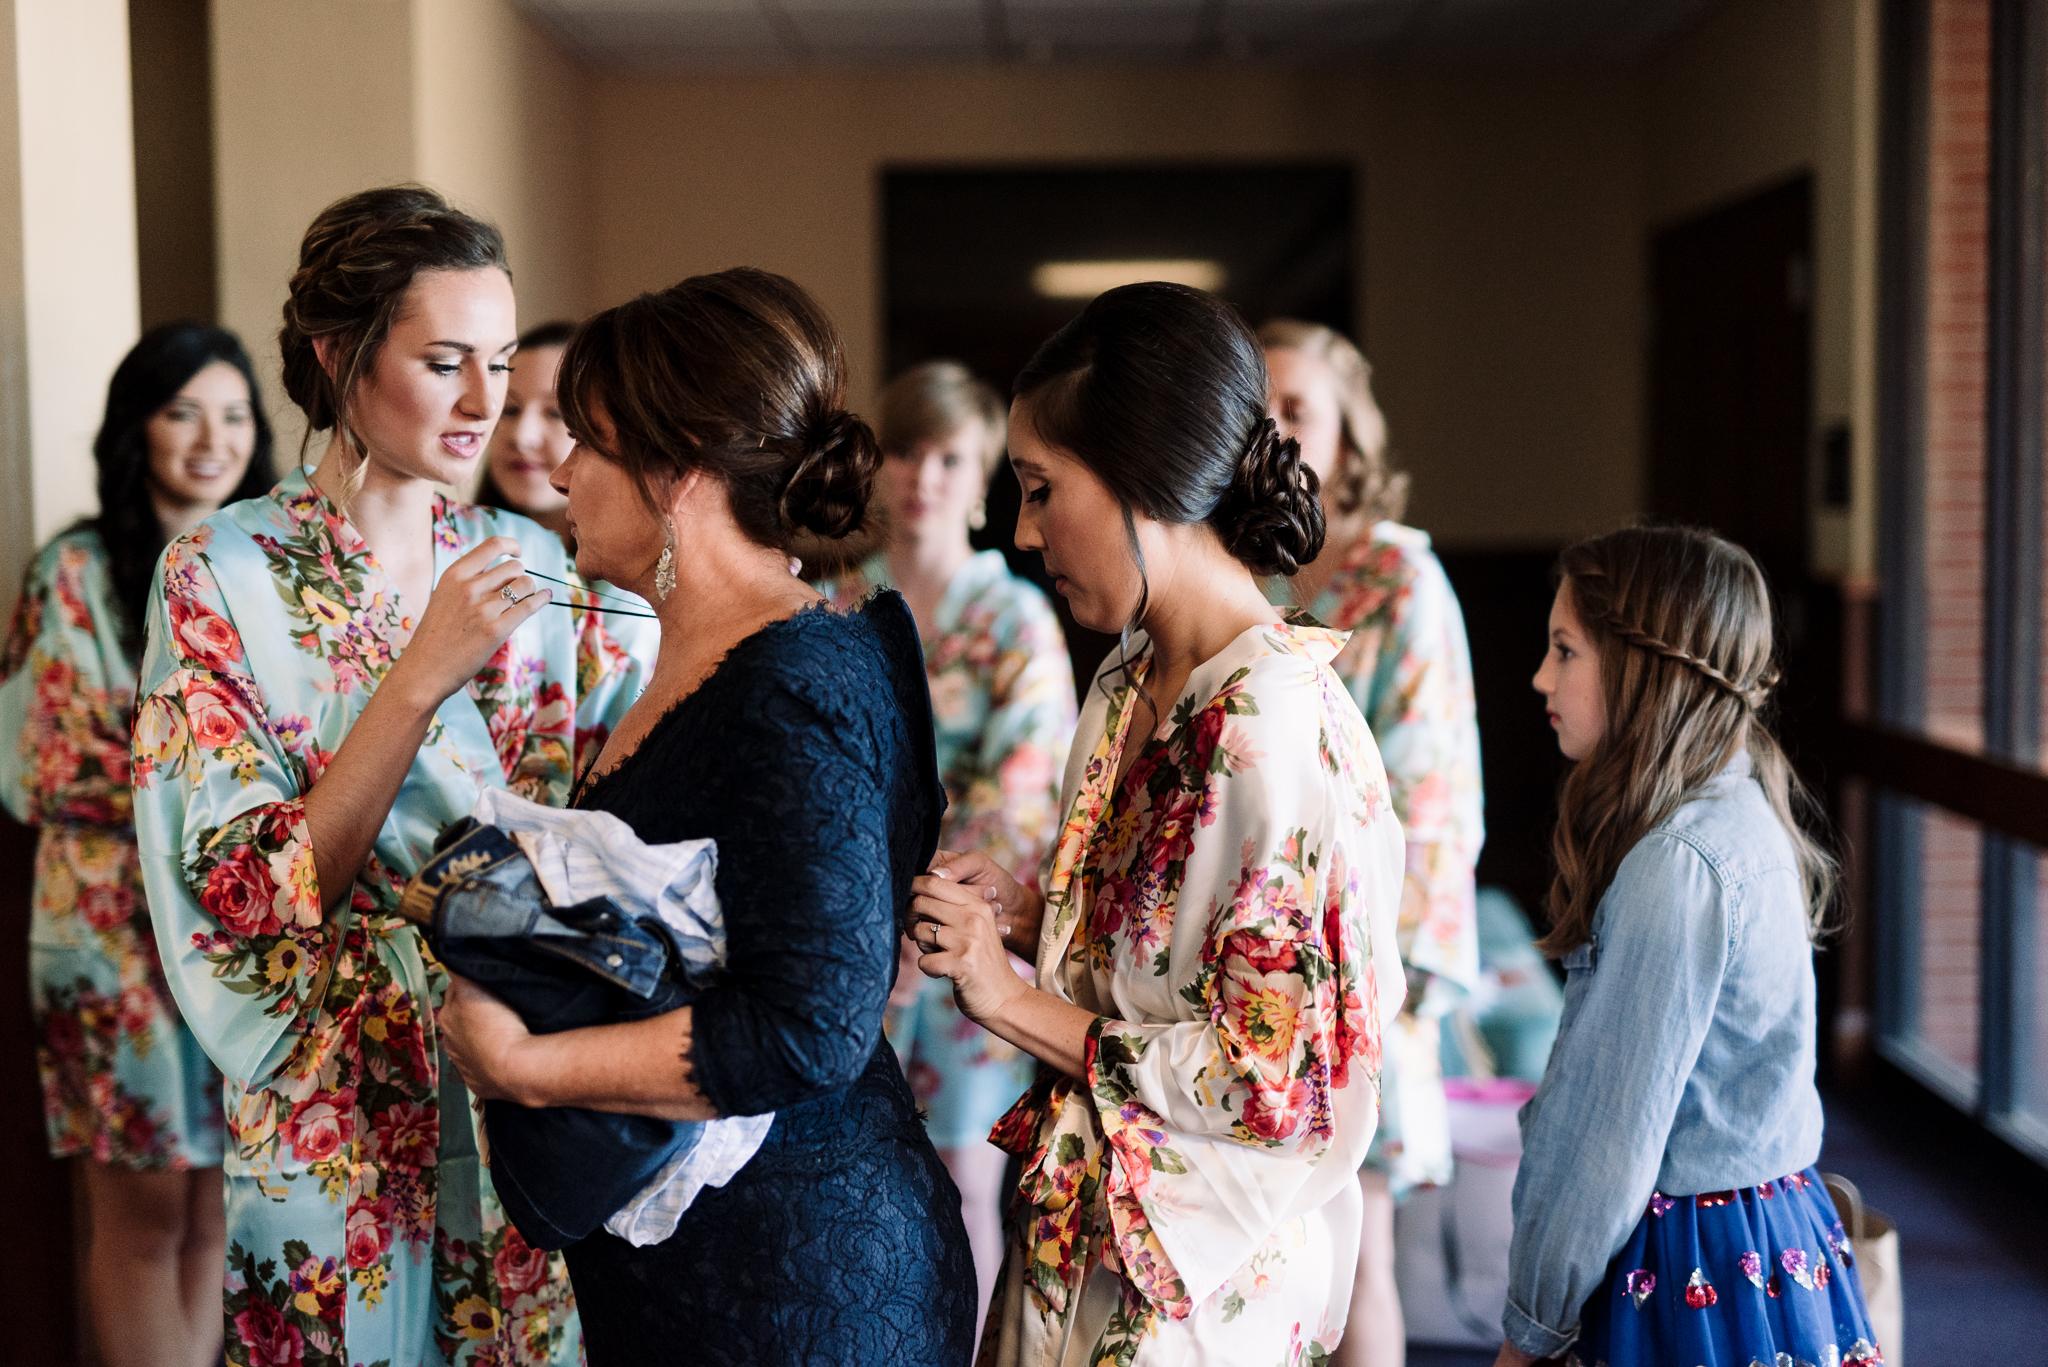 Oklahoma-Christian-University-Wedding-7578.jpg